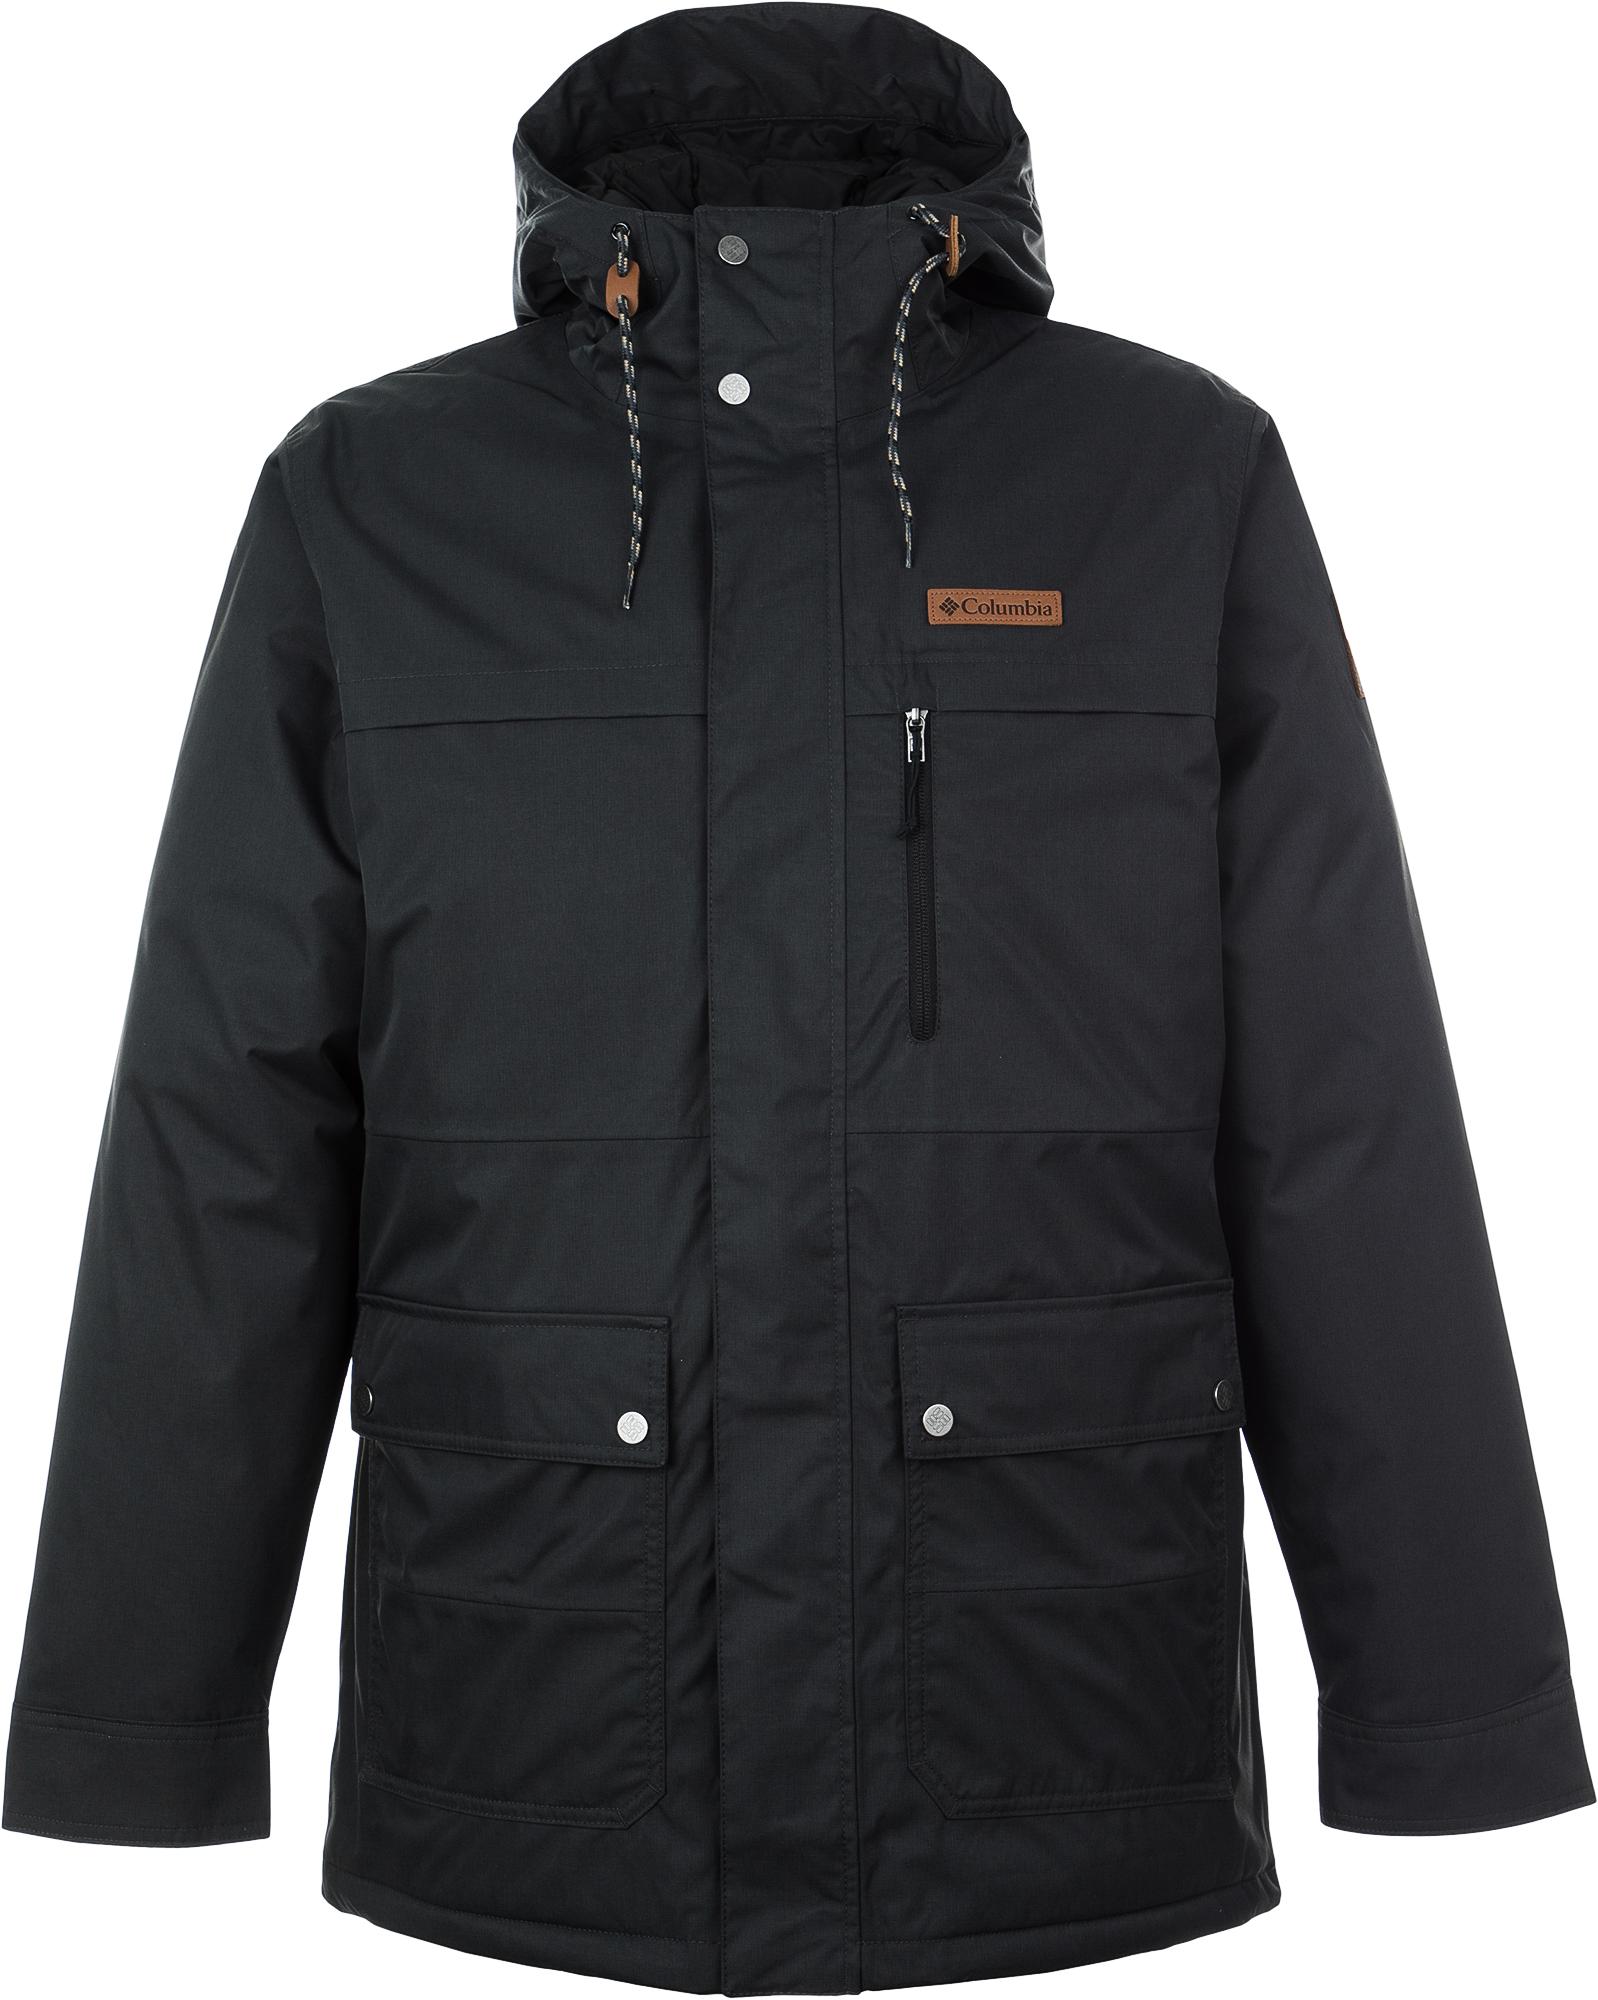 Columbia Куртка утепленная мужская Norton Bay, размер 56